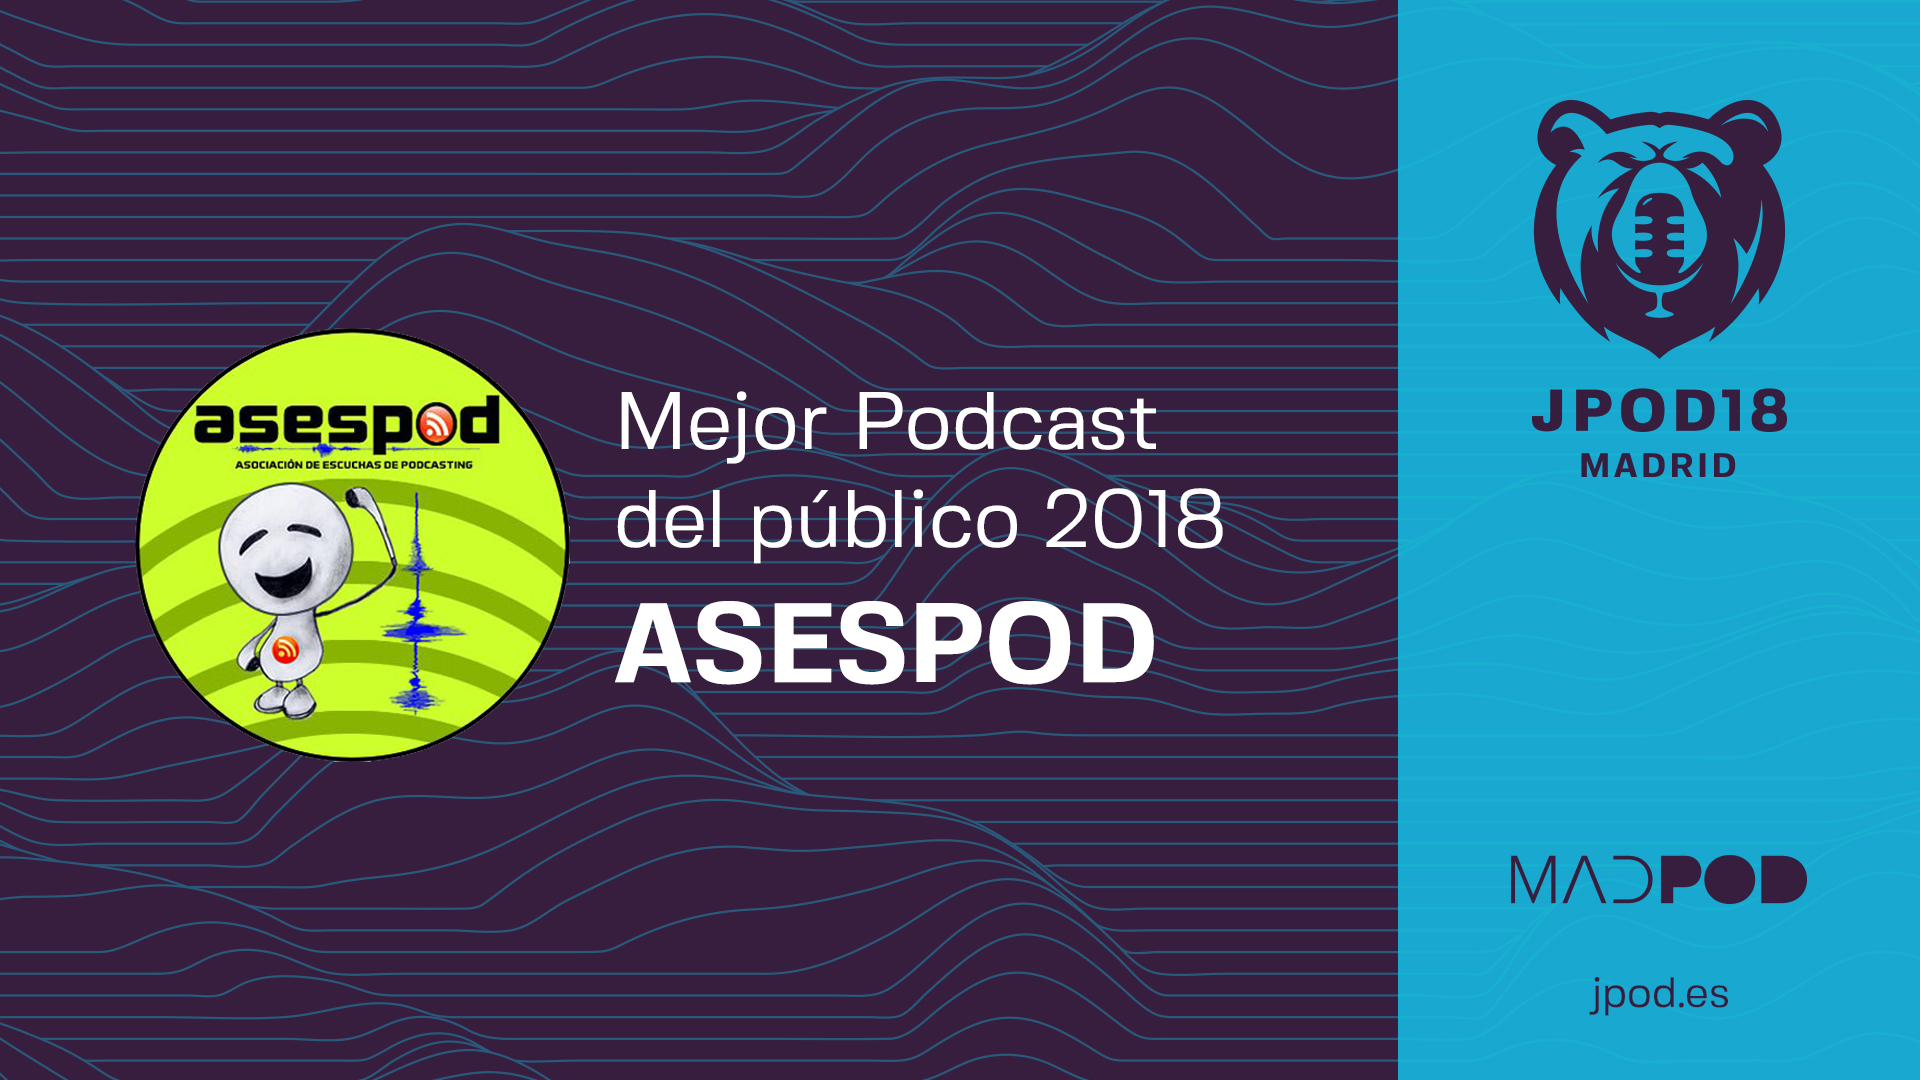 Mejor podcast del público 2018